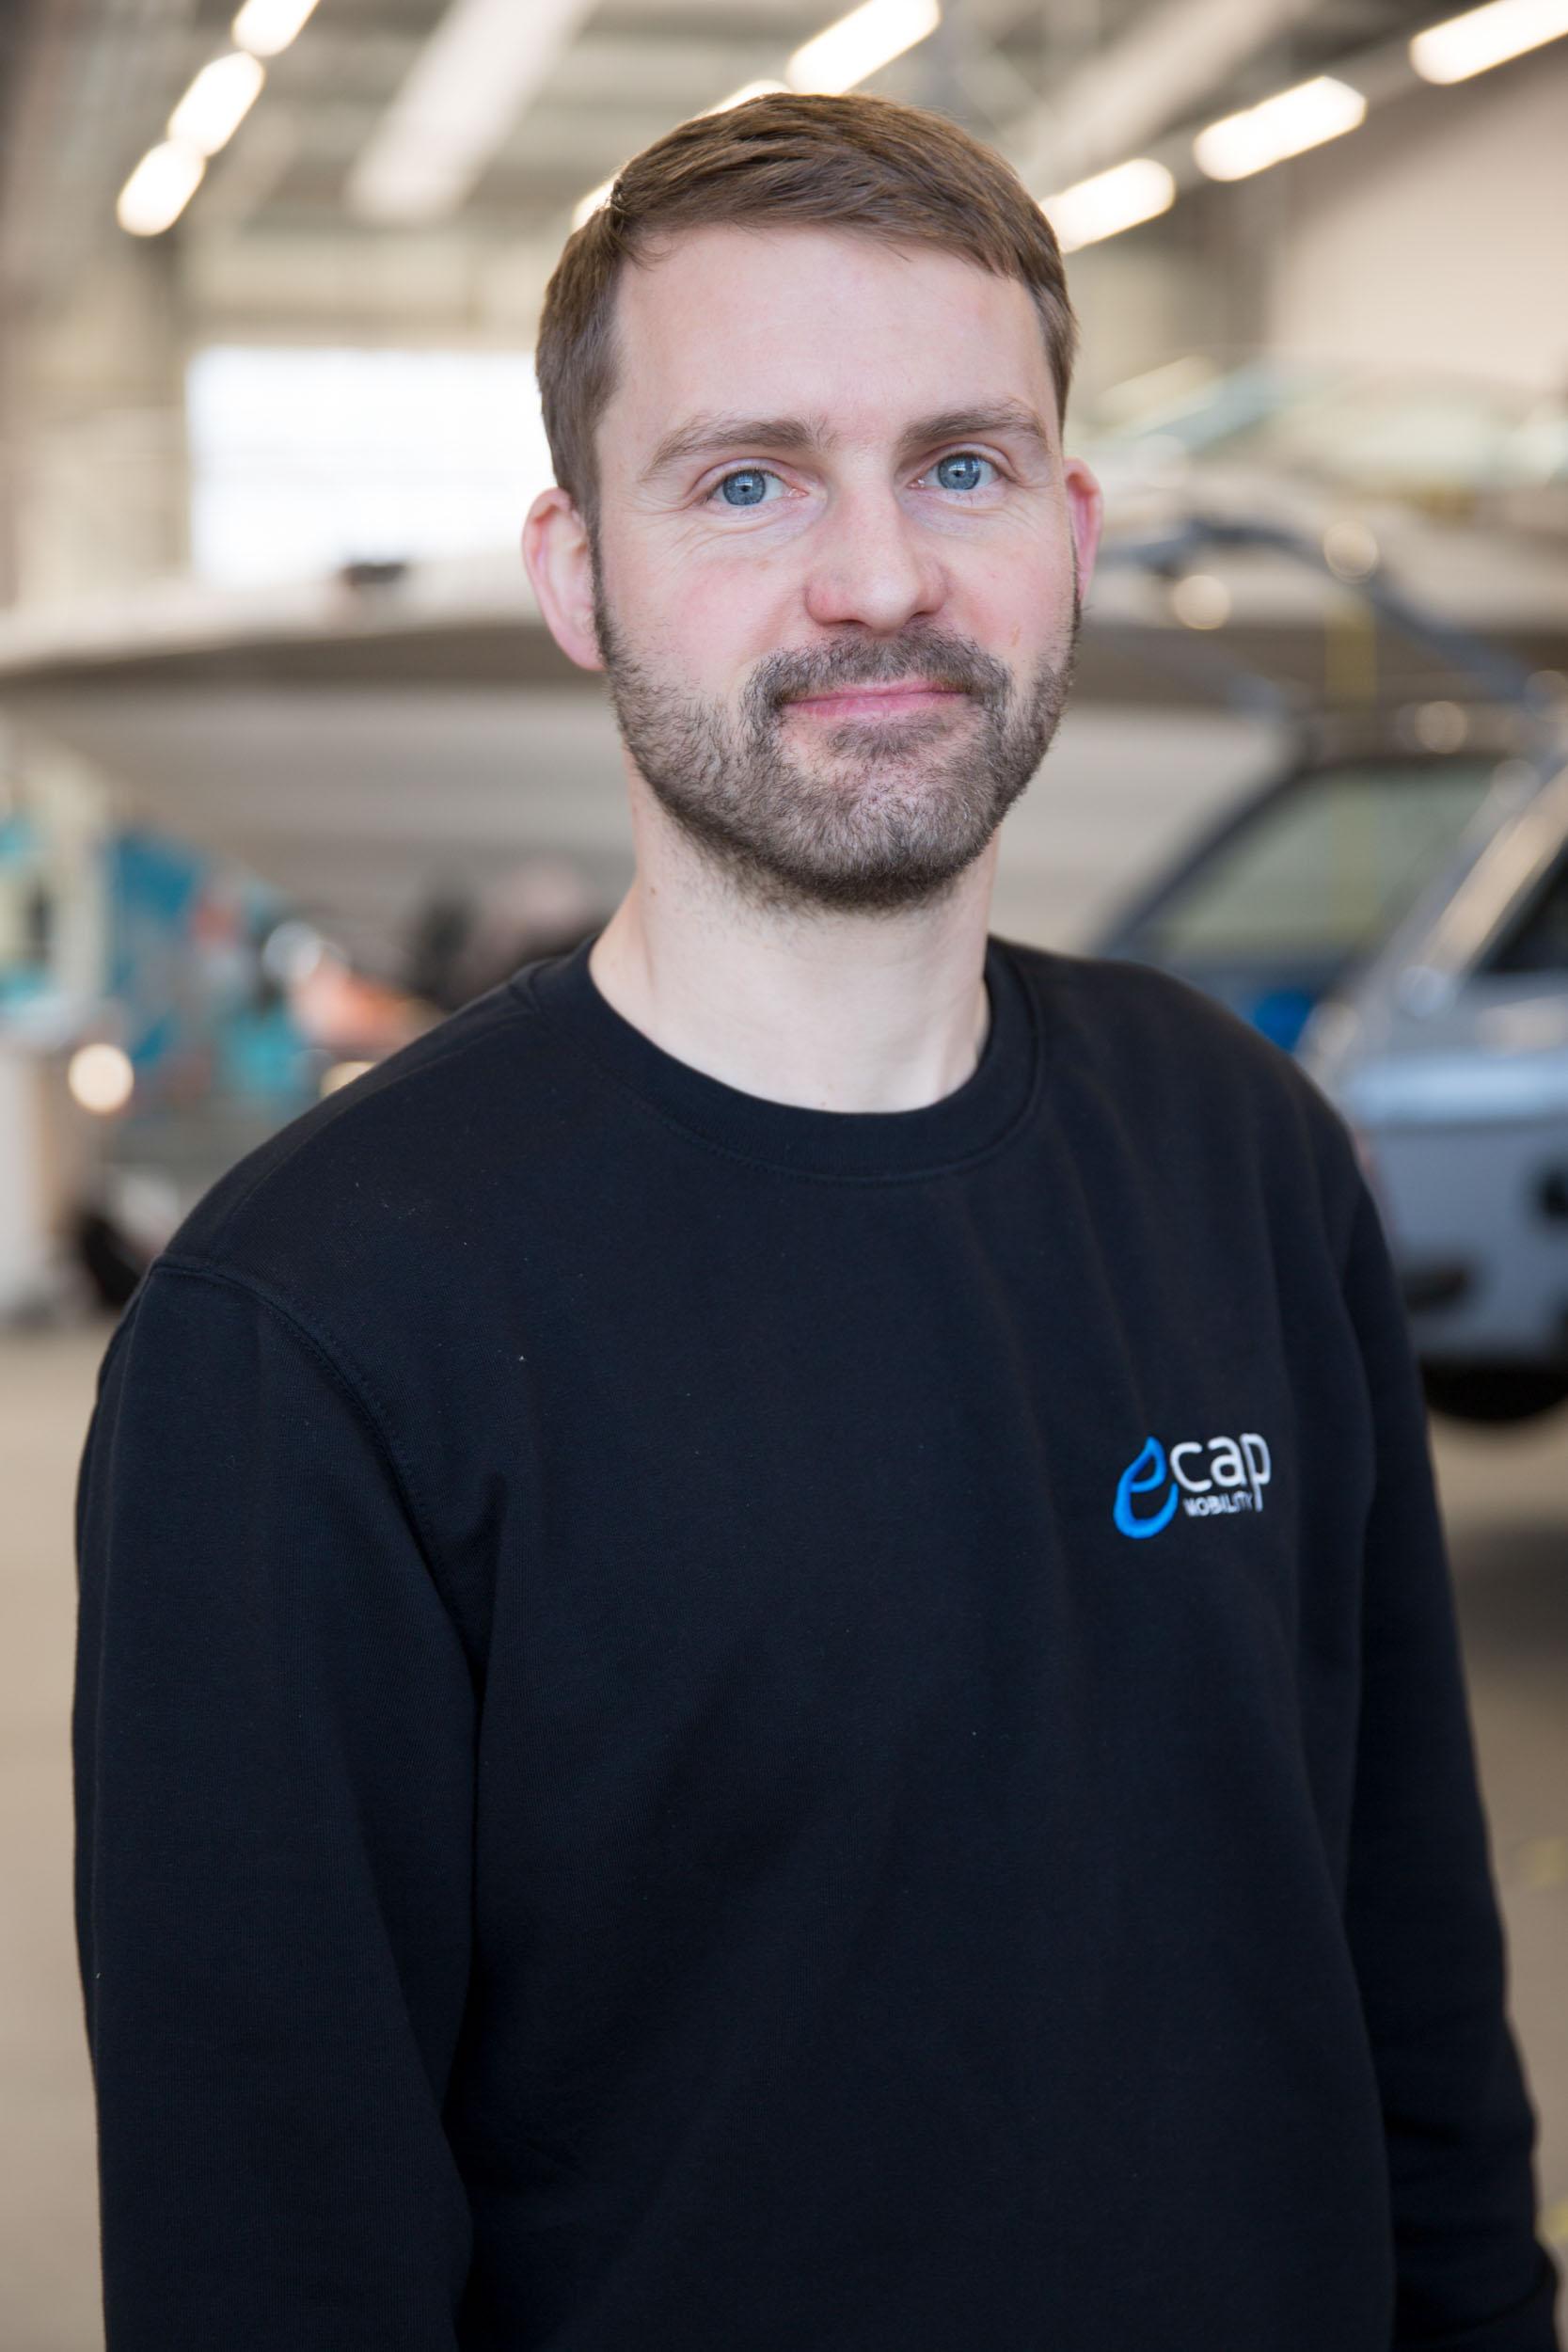 Lars Ewert | Master Mechanic lew@ecap-mobility.com